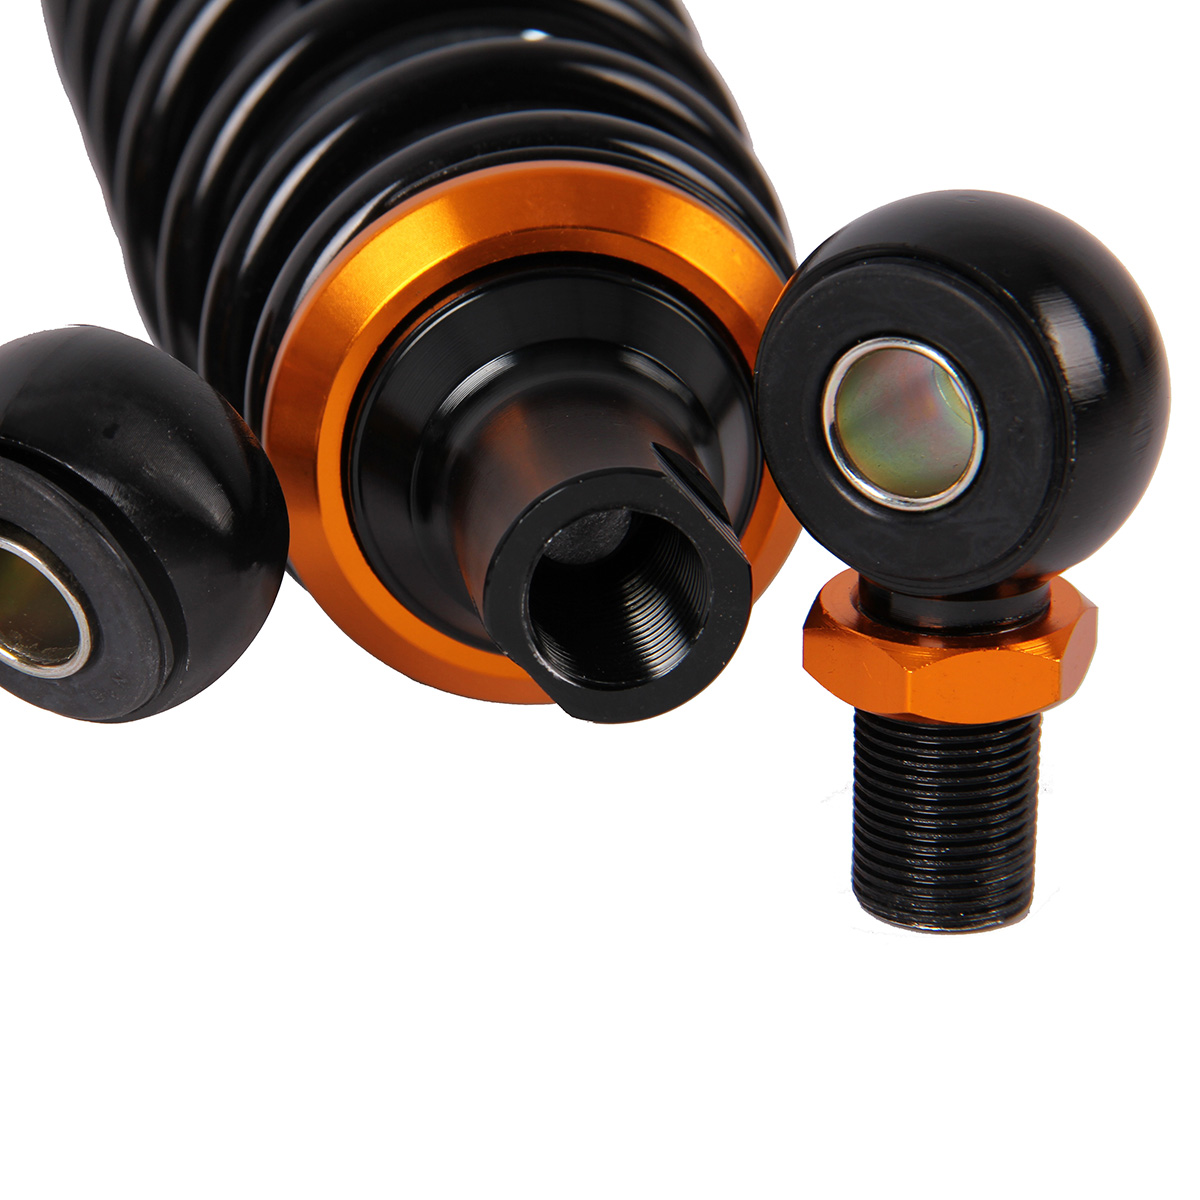 POSSBAY Universal 320mm Black Motorcycle Dirt Bike Rear Suspension Air Shock Absorber Round Hole/U Type Black Orange